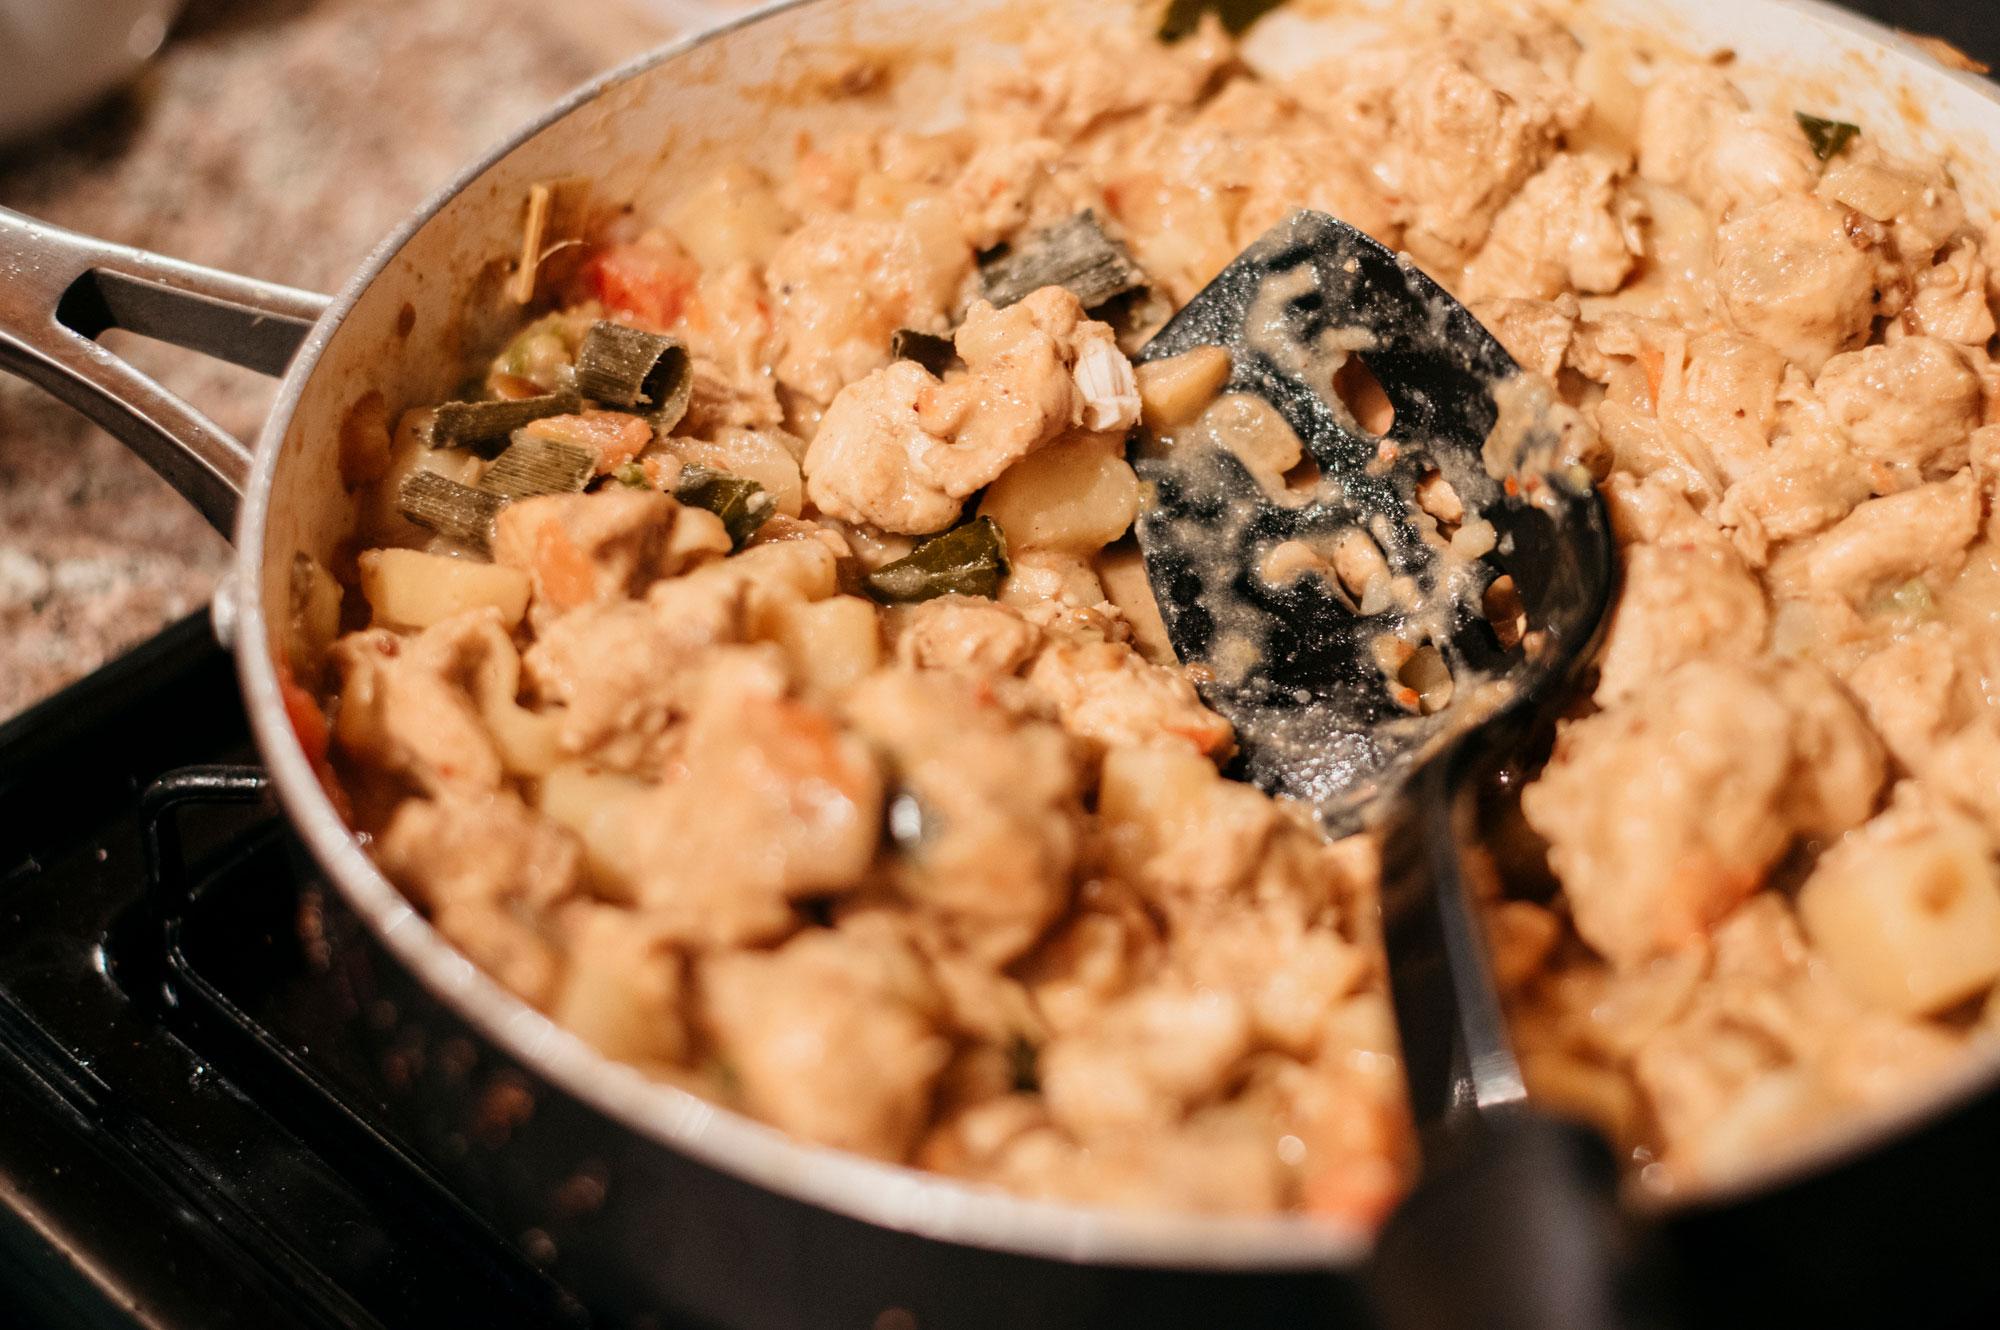 Los_Angeles_Food_photographer_Rebecca_Peloquin_Sri_Lankan_Food_011.JPG